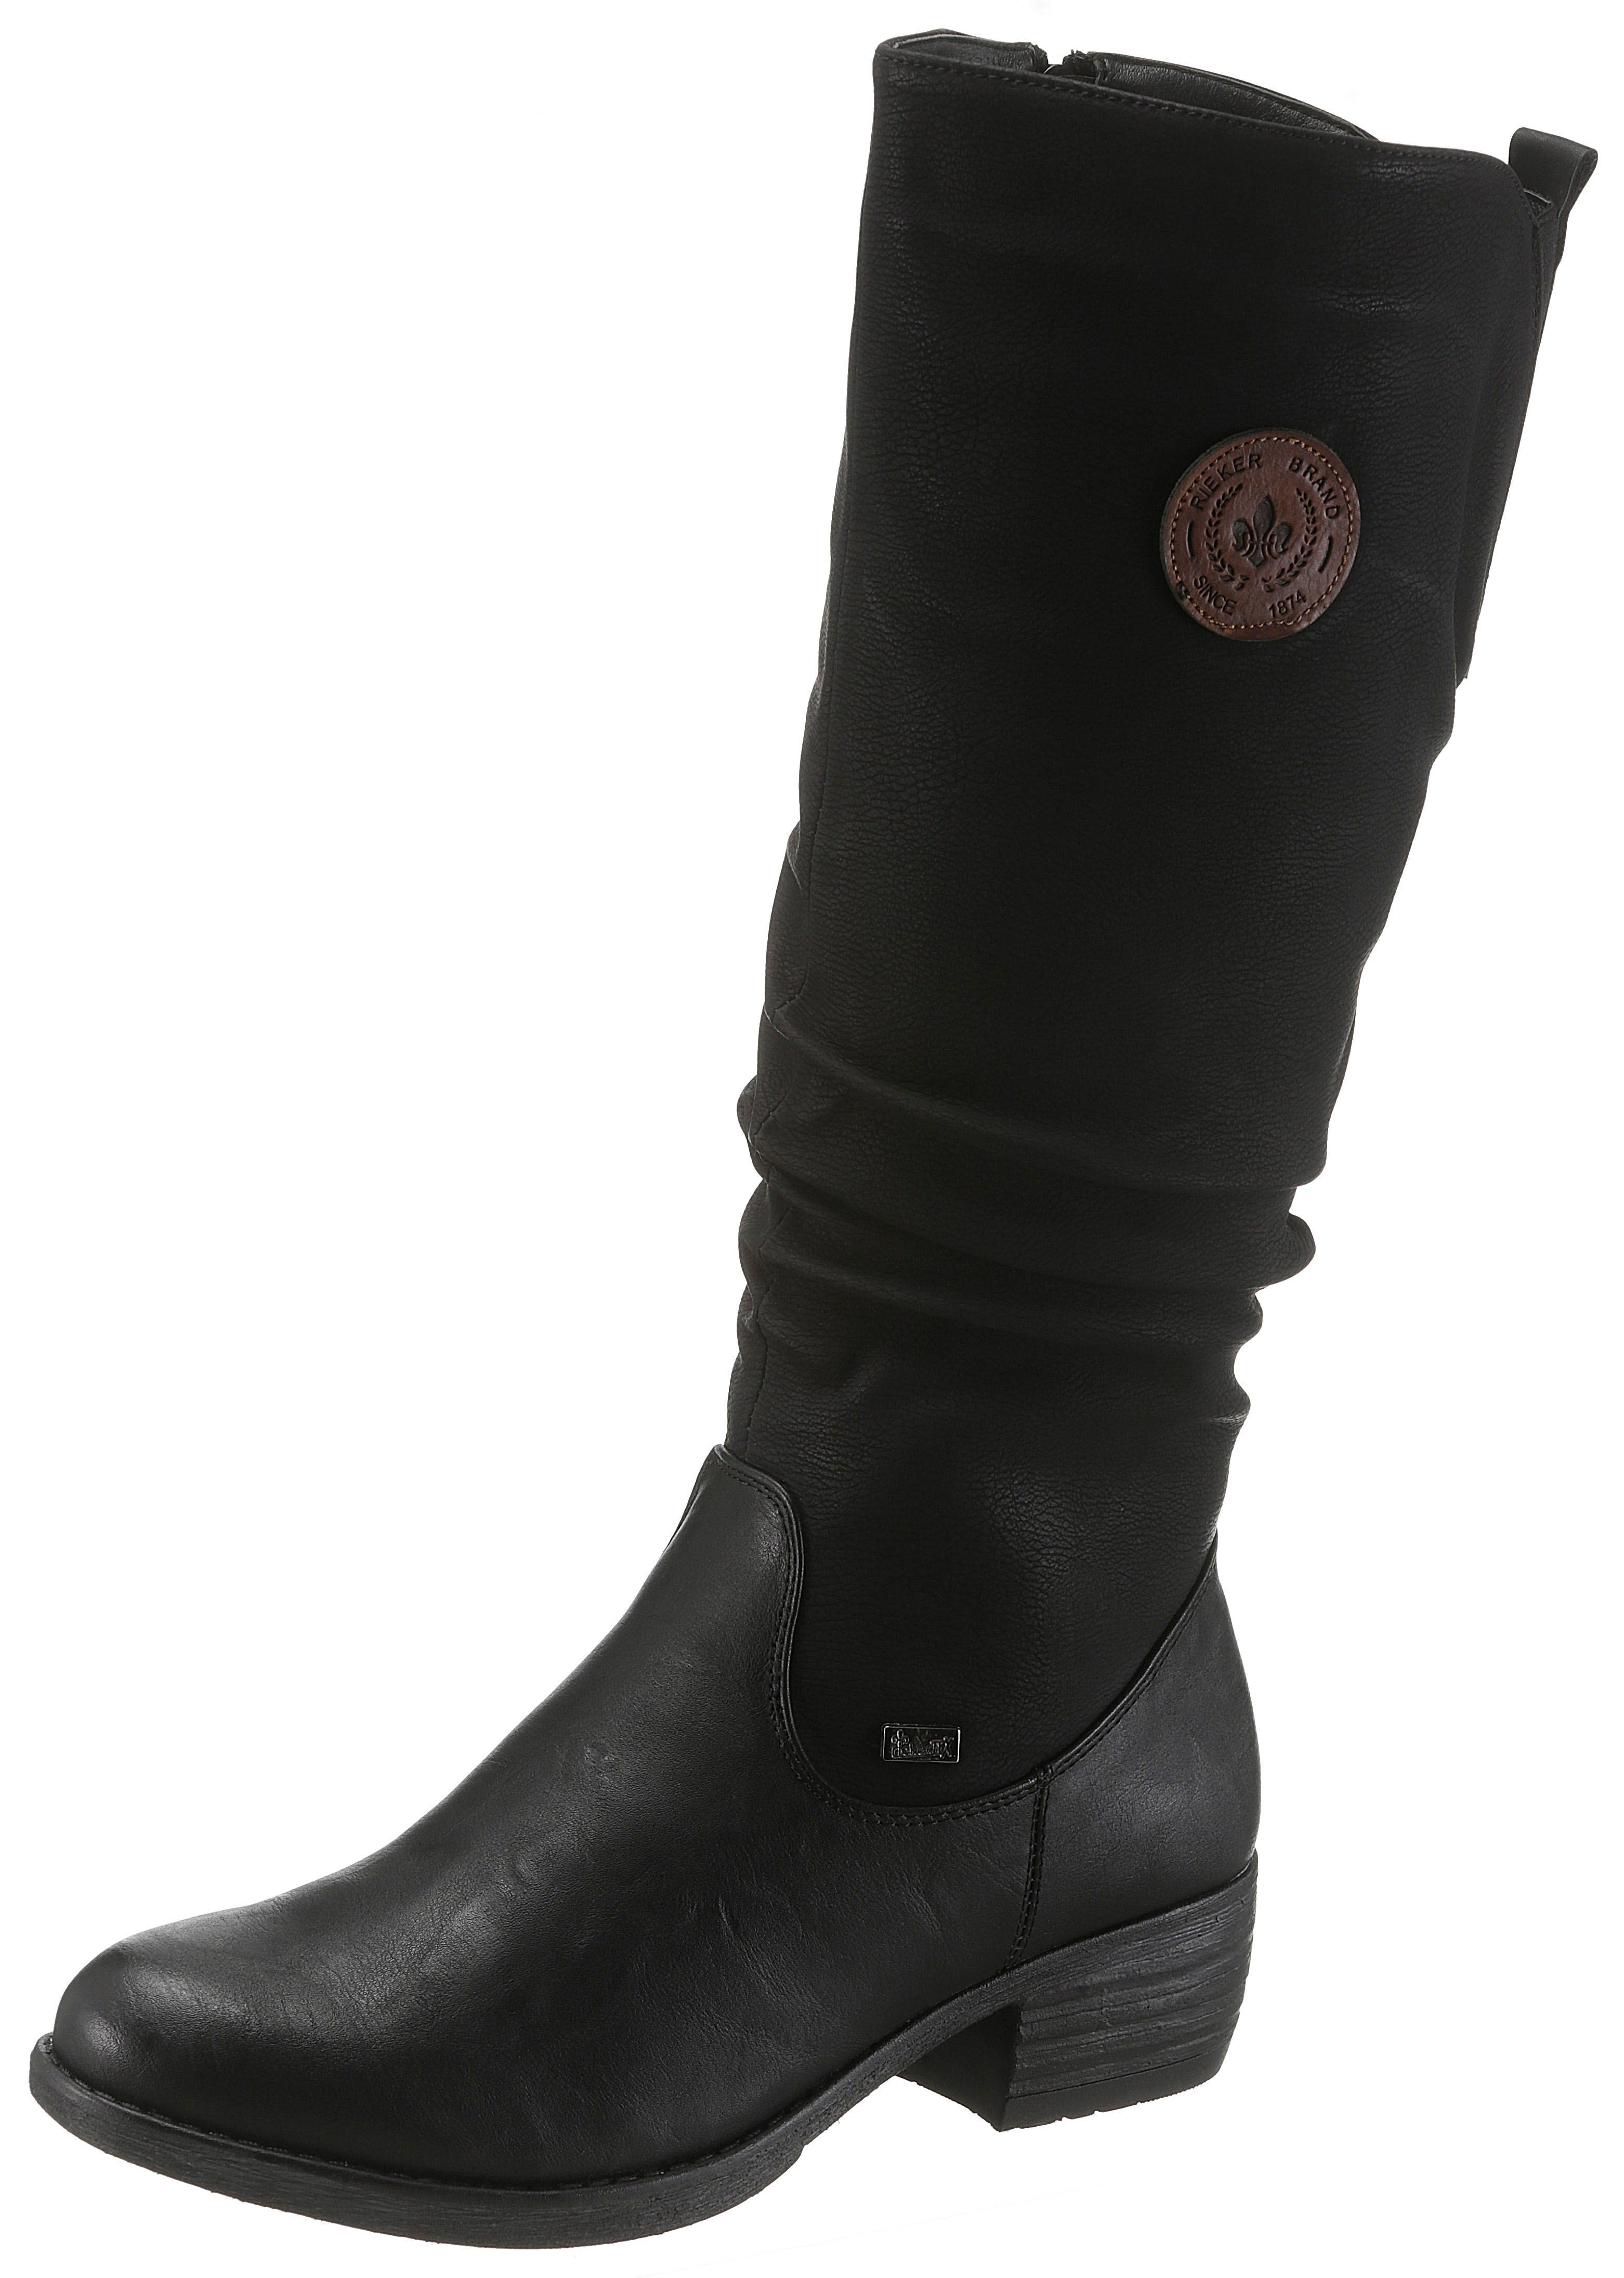 Rieker Winterstiefel | Schuhe > Stiefel > Winterstiefel | Schwarz | Rieker